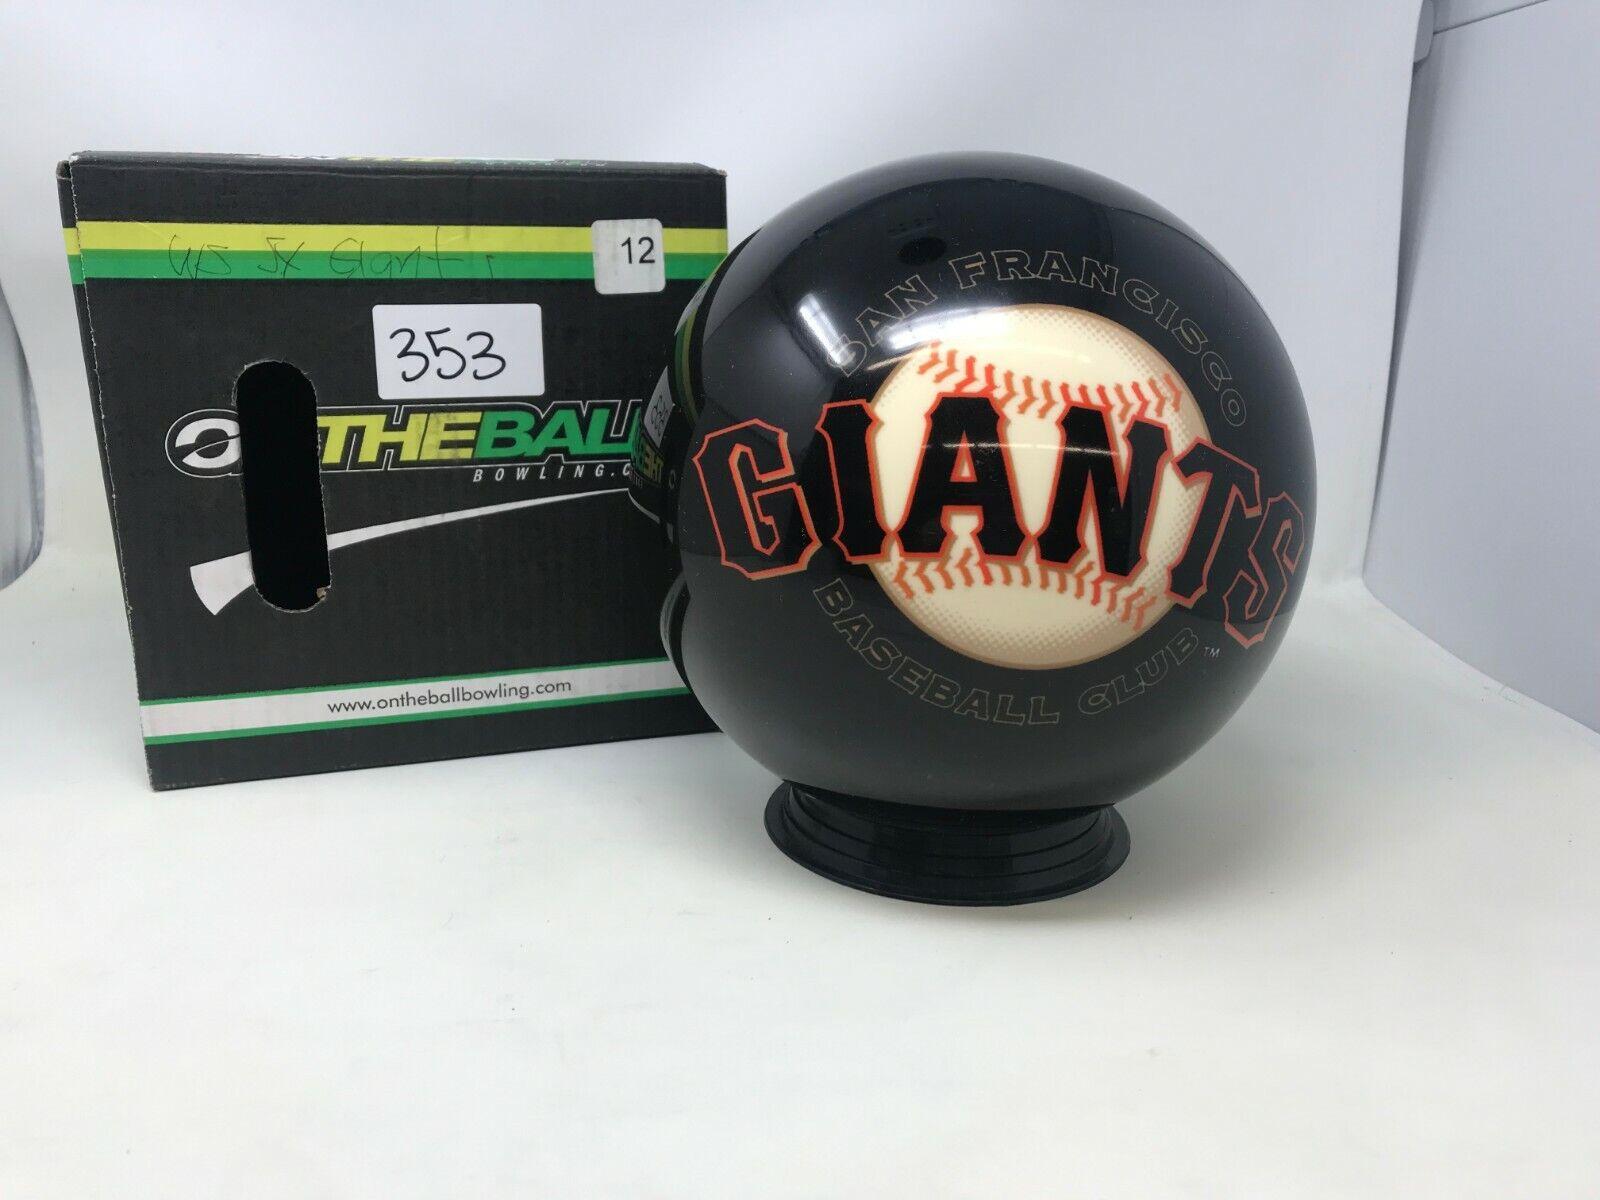 New OTB MLB San Francisco Giants 12Bowling Ball Viz-a-Ball (353)